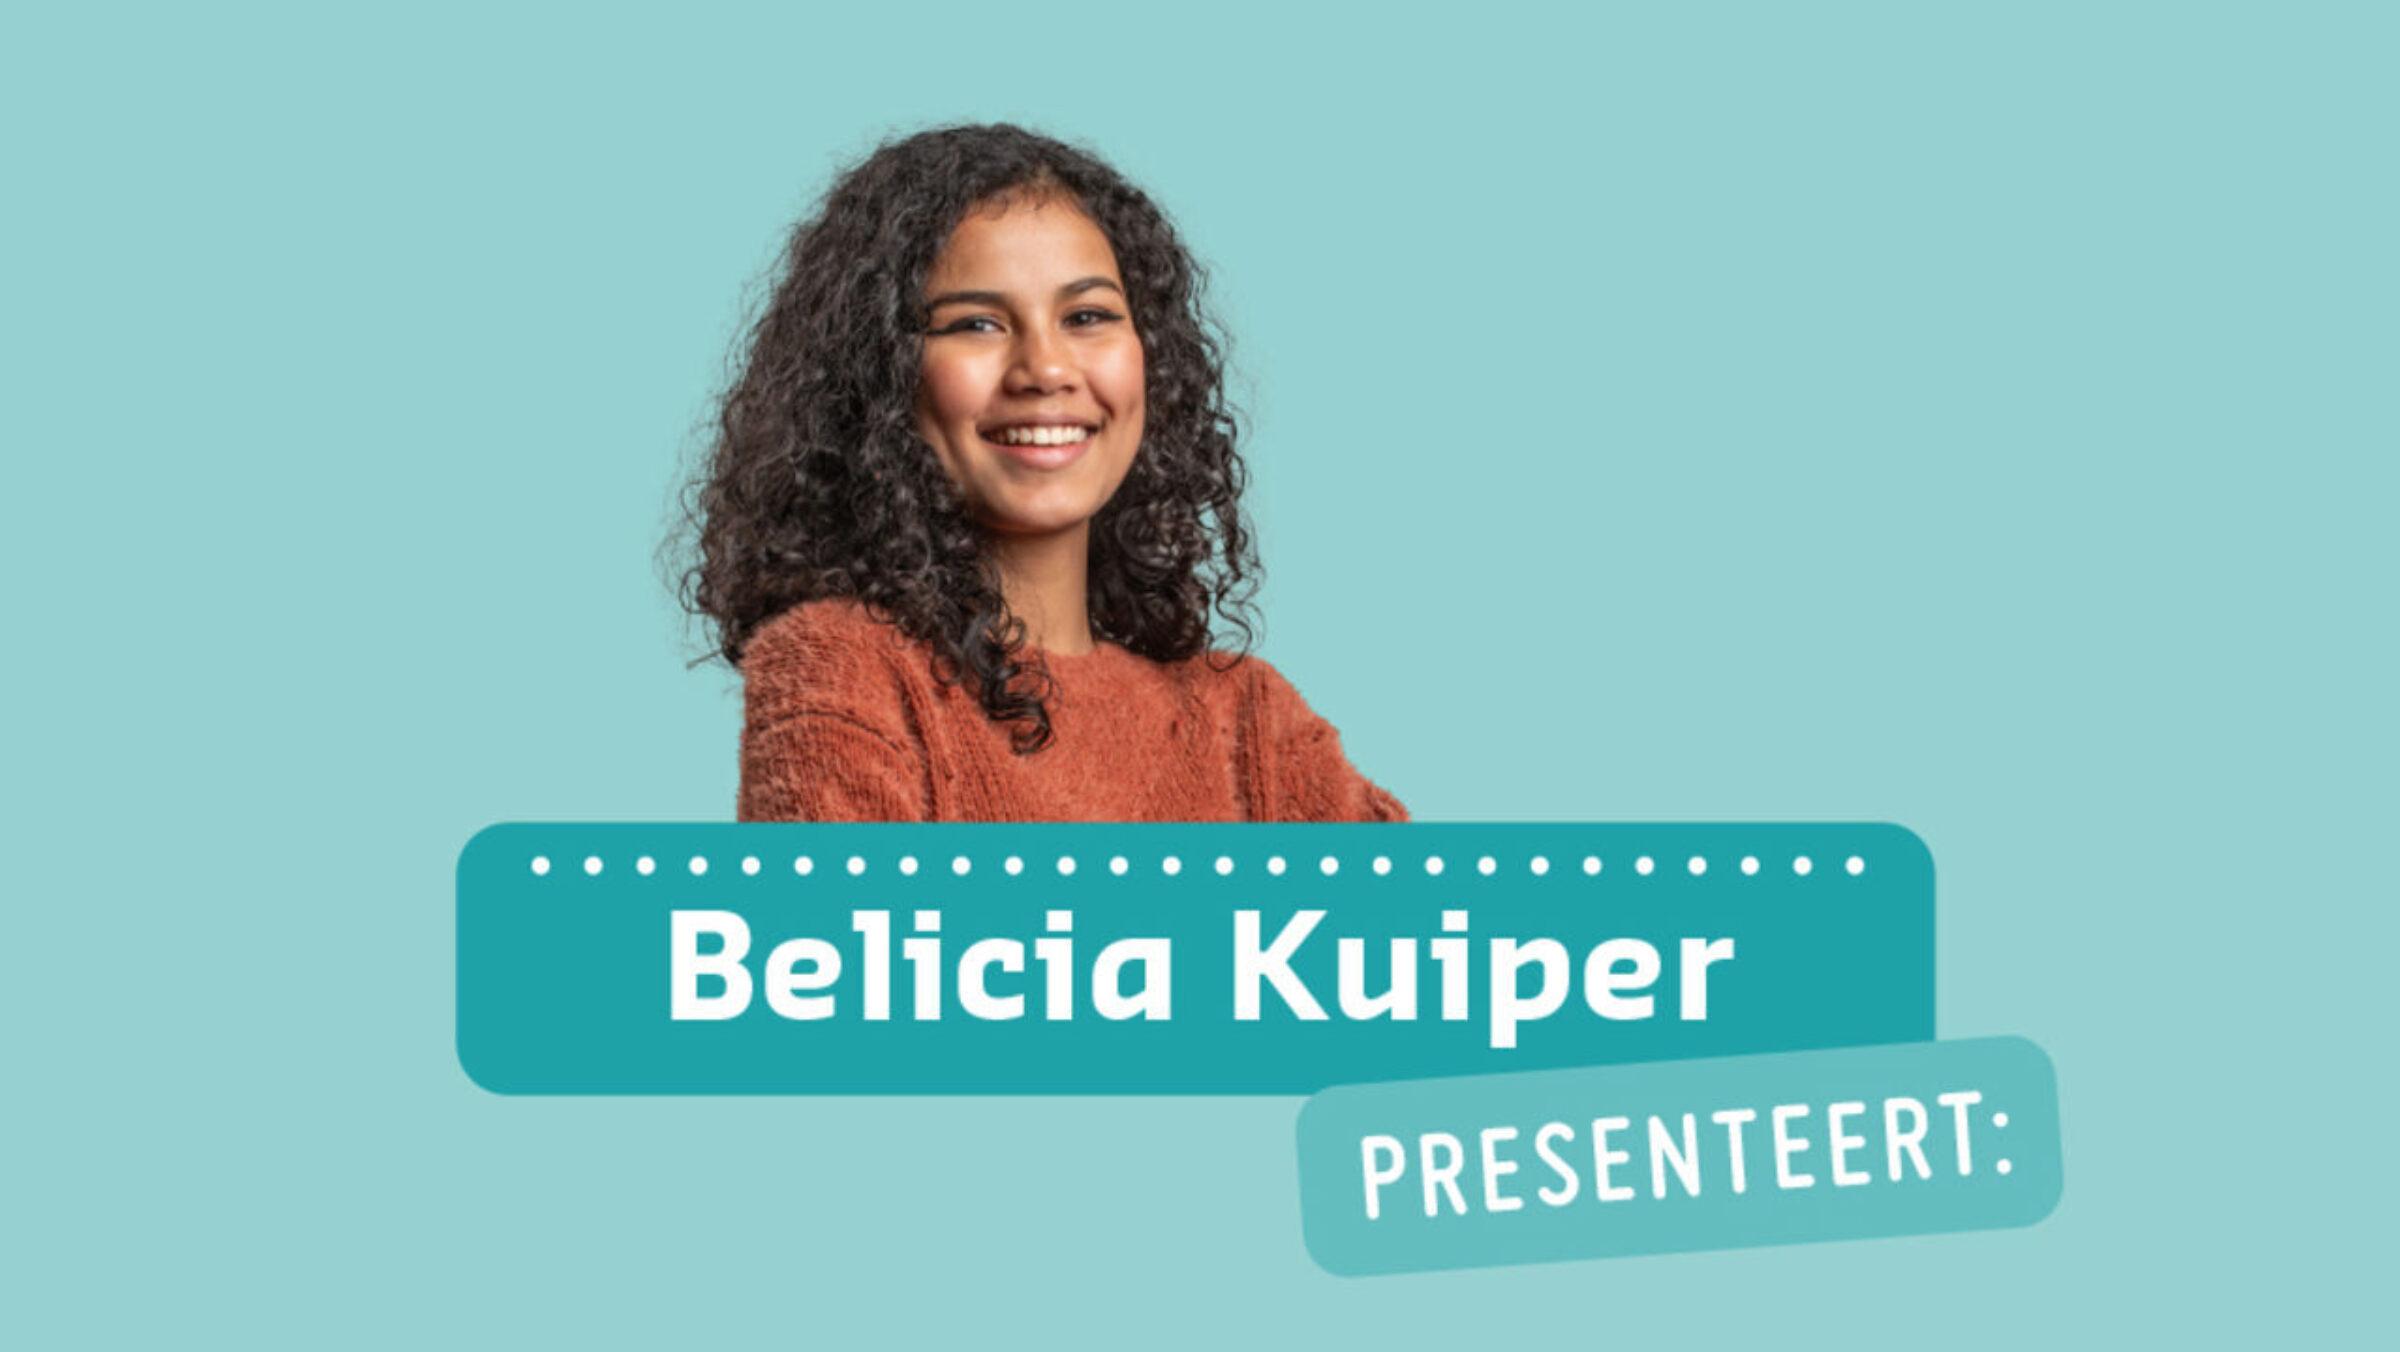 Belicia Kuiper